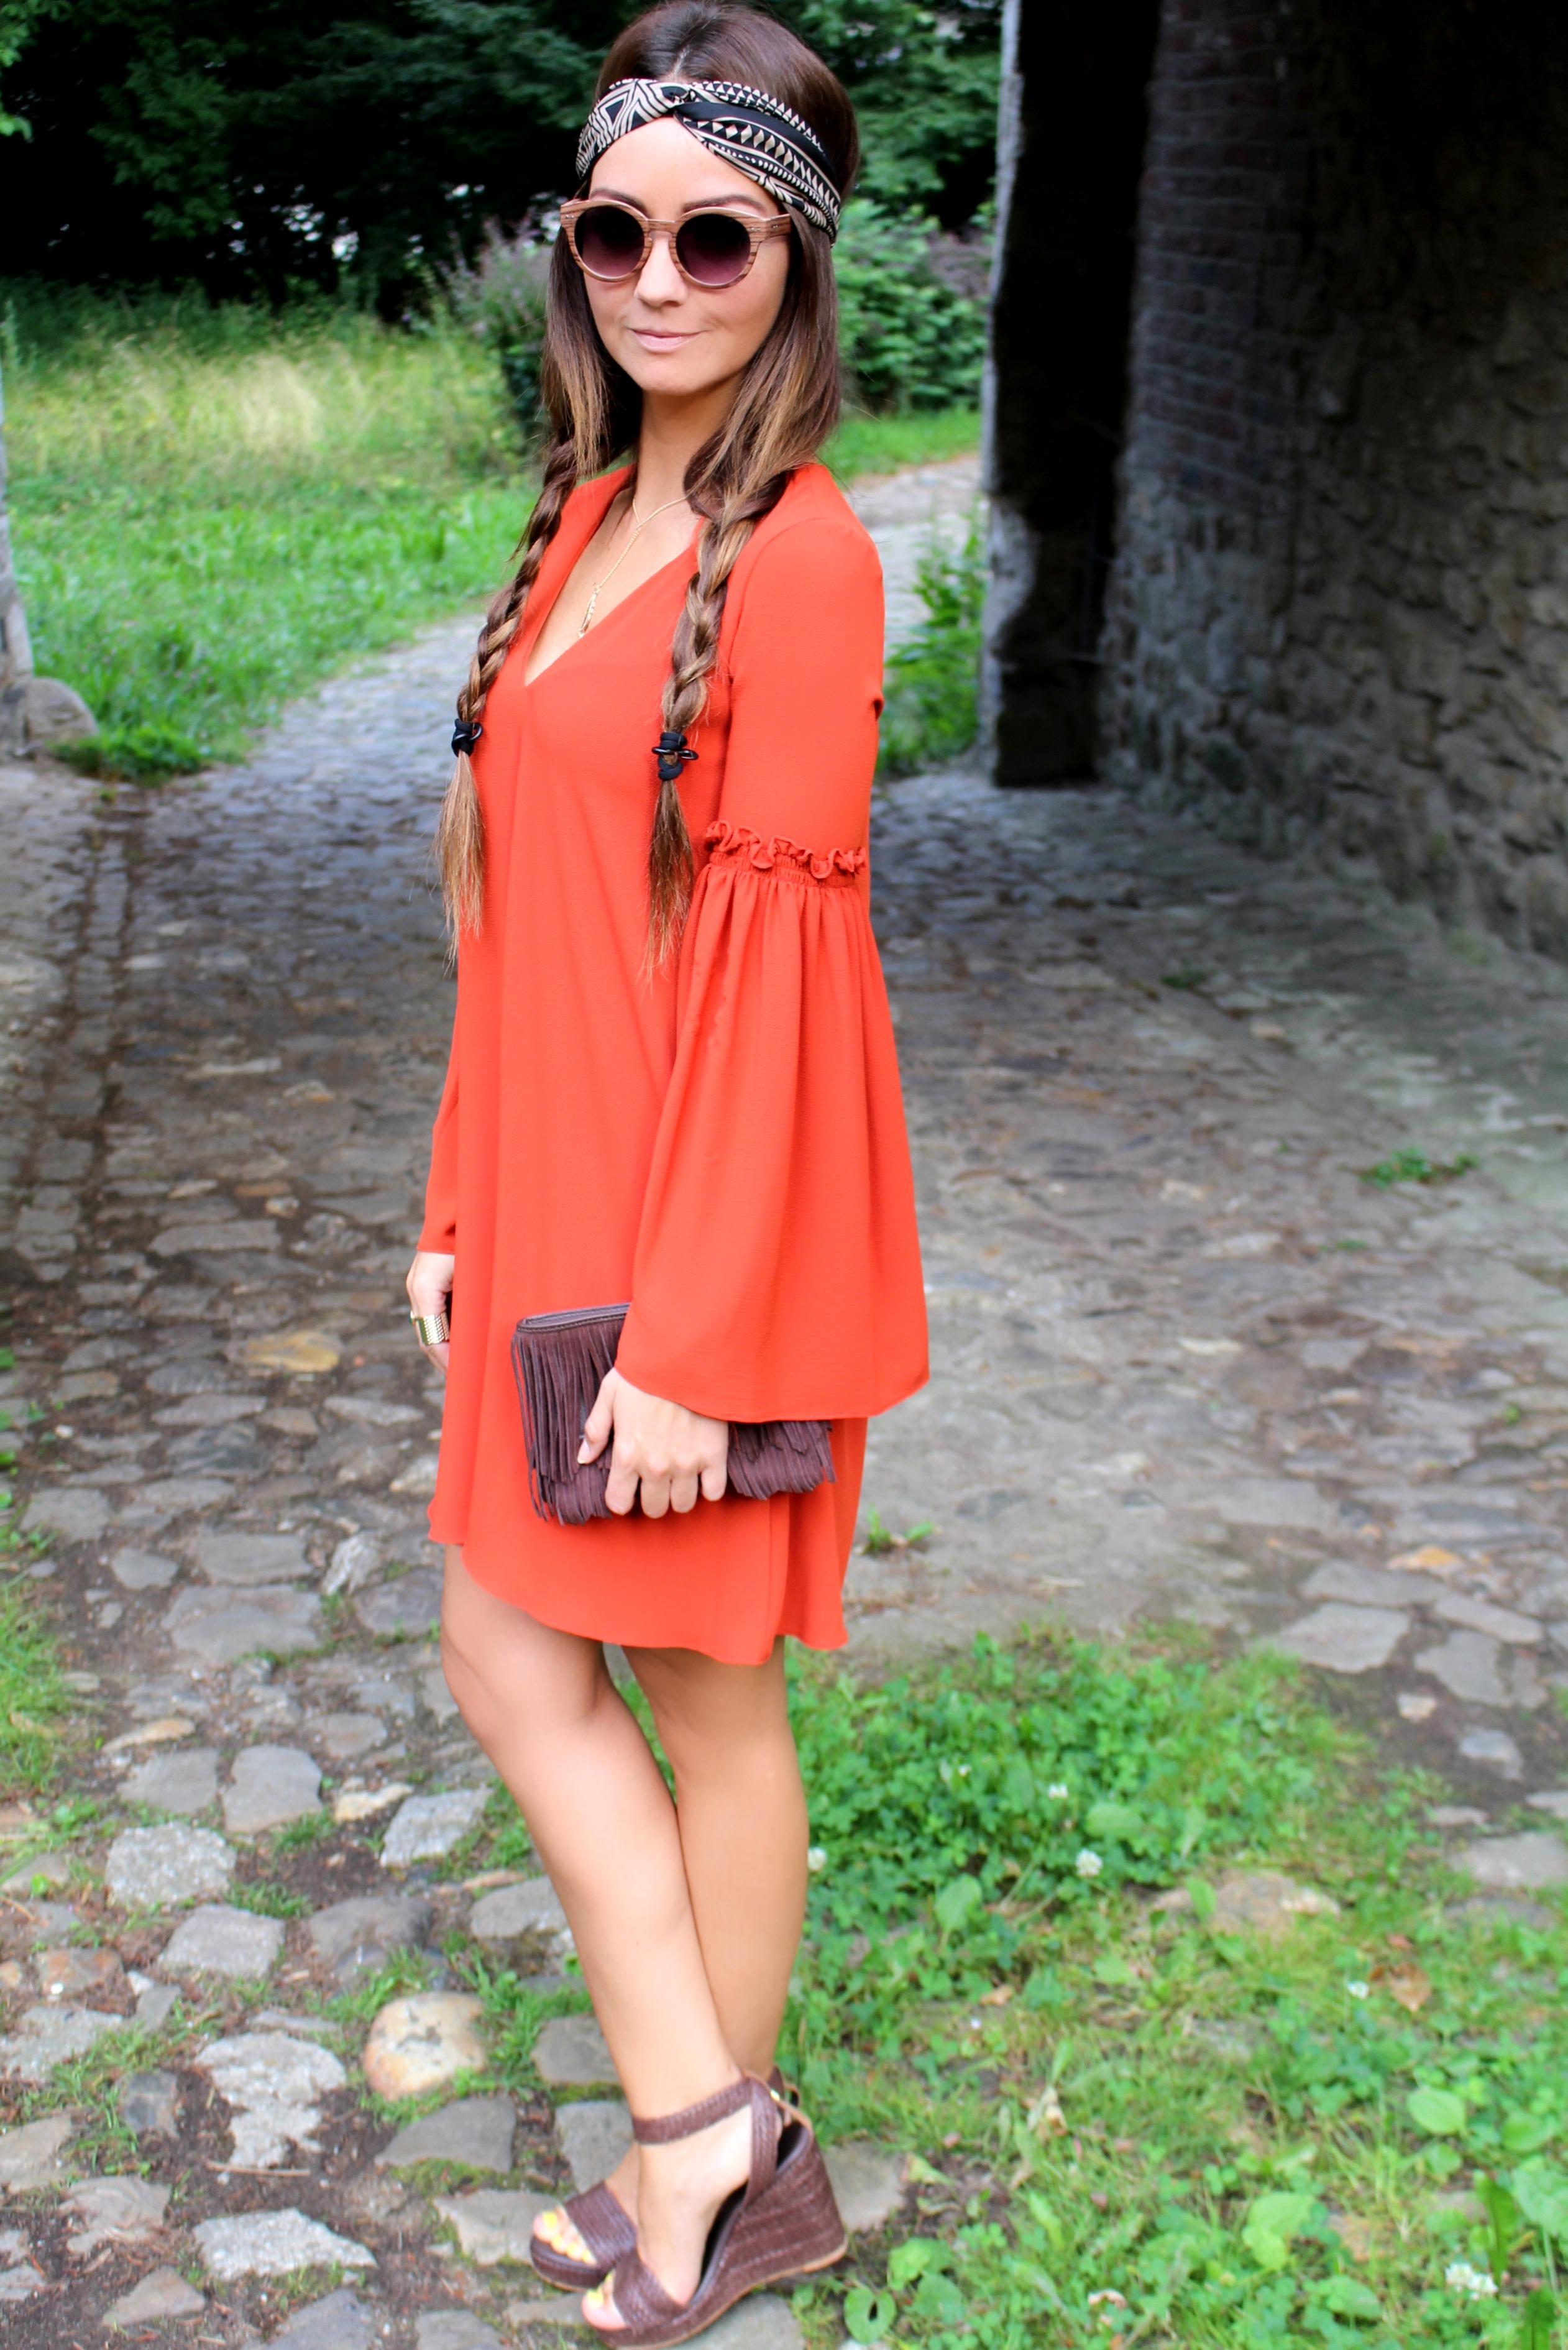 Fashioncircuz by Jenny img_0400a HIPPIEGIRL IN RED